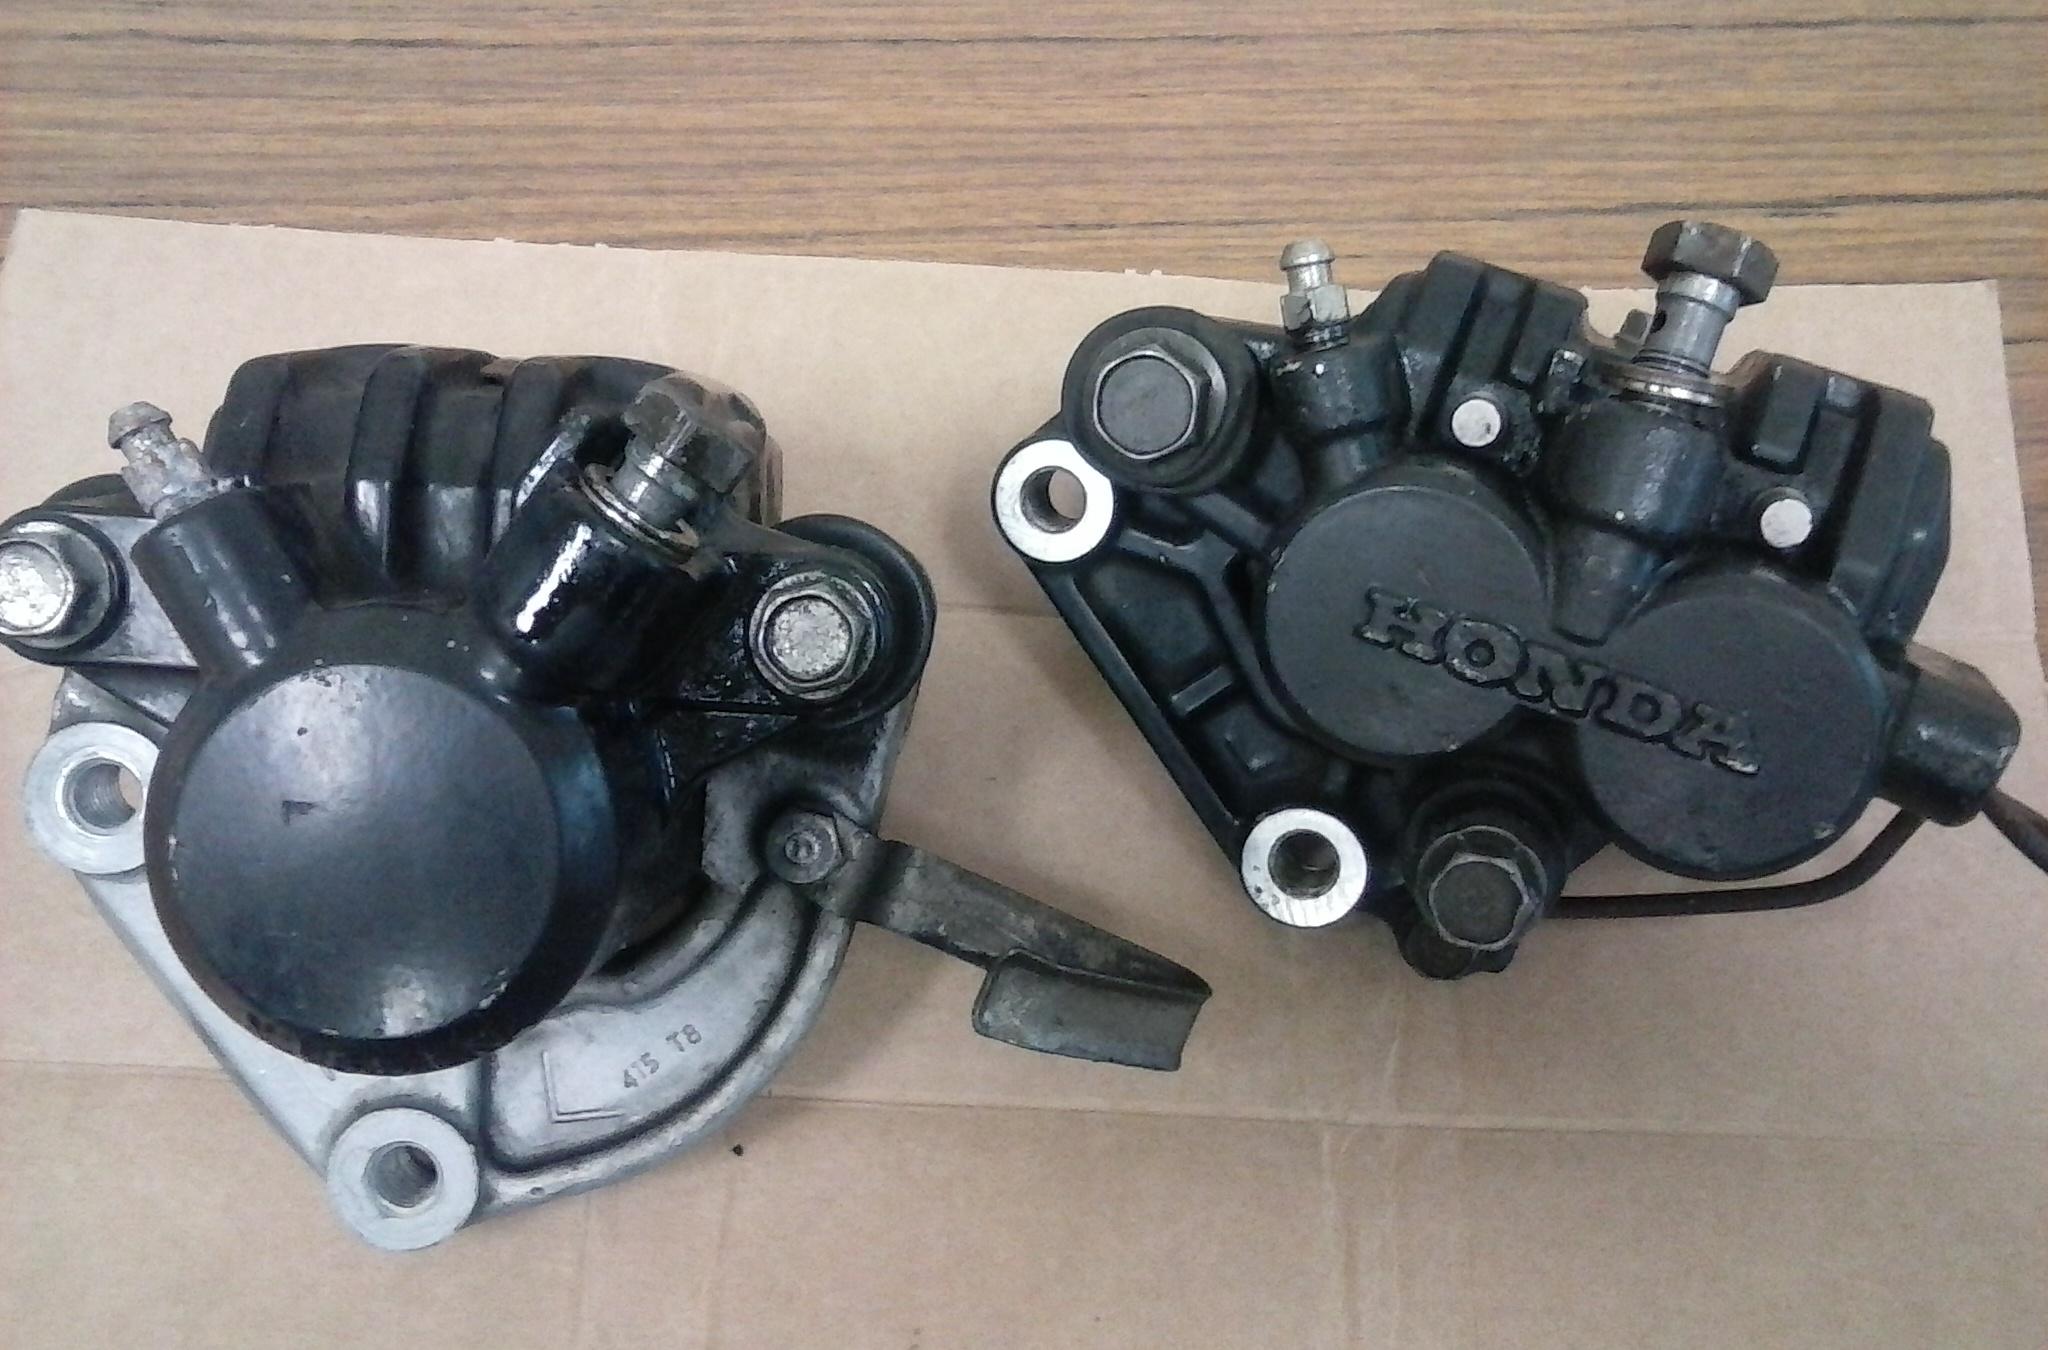 http://cx500forum.com/forum/attachments/technical-help-forum/69705d1484082163-cx500-dual-pot-caliper-upgrade-calipers-1-.jpg